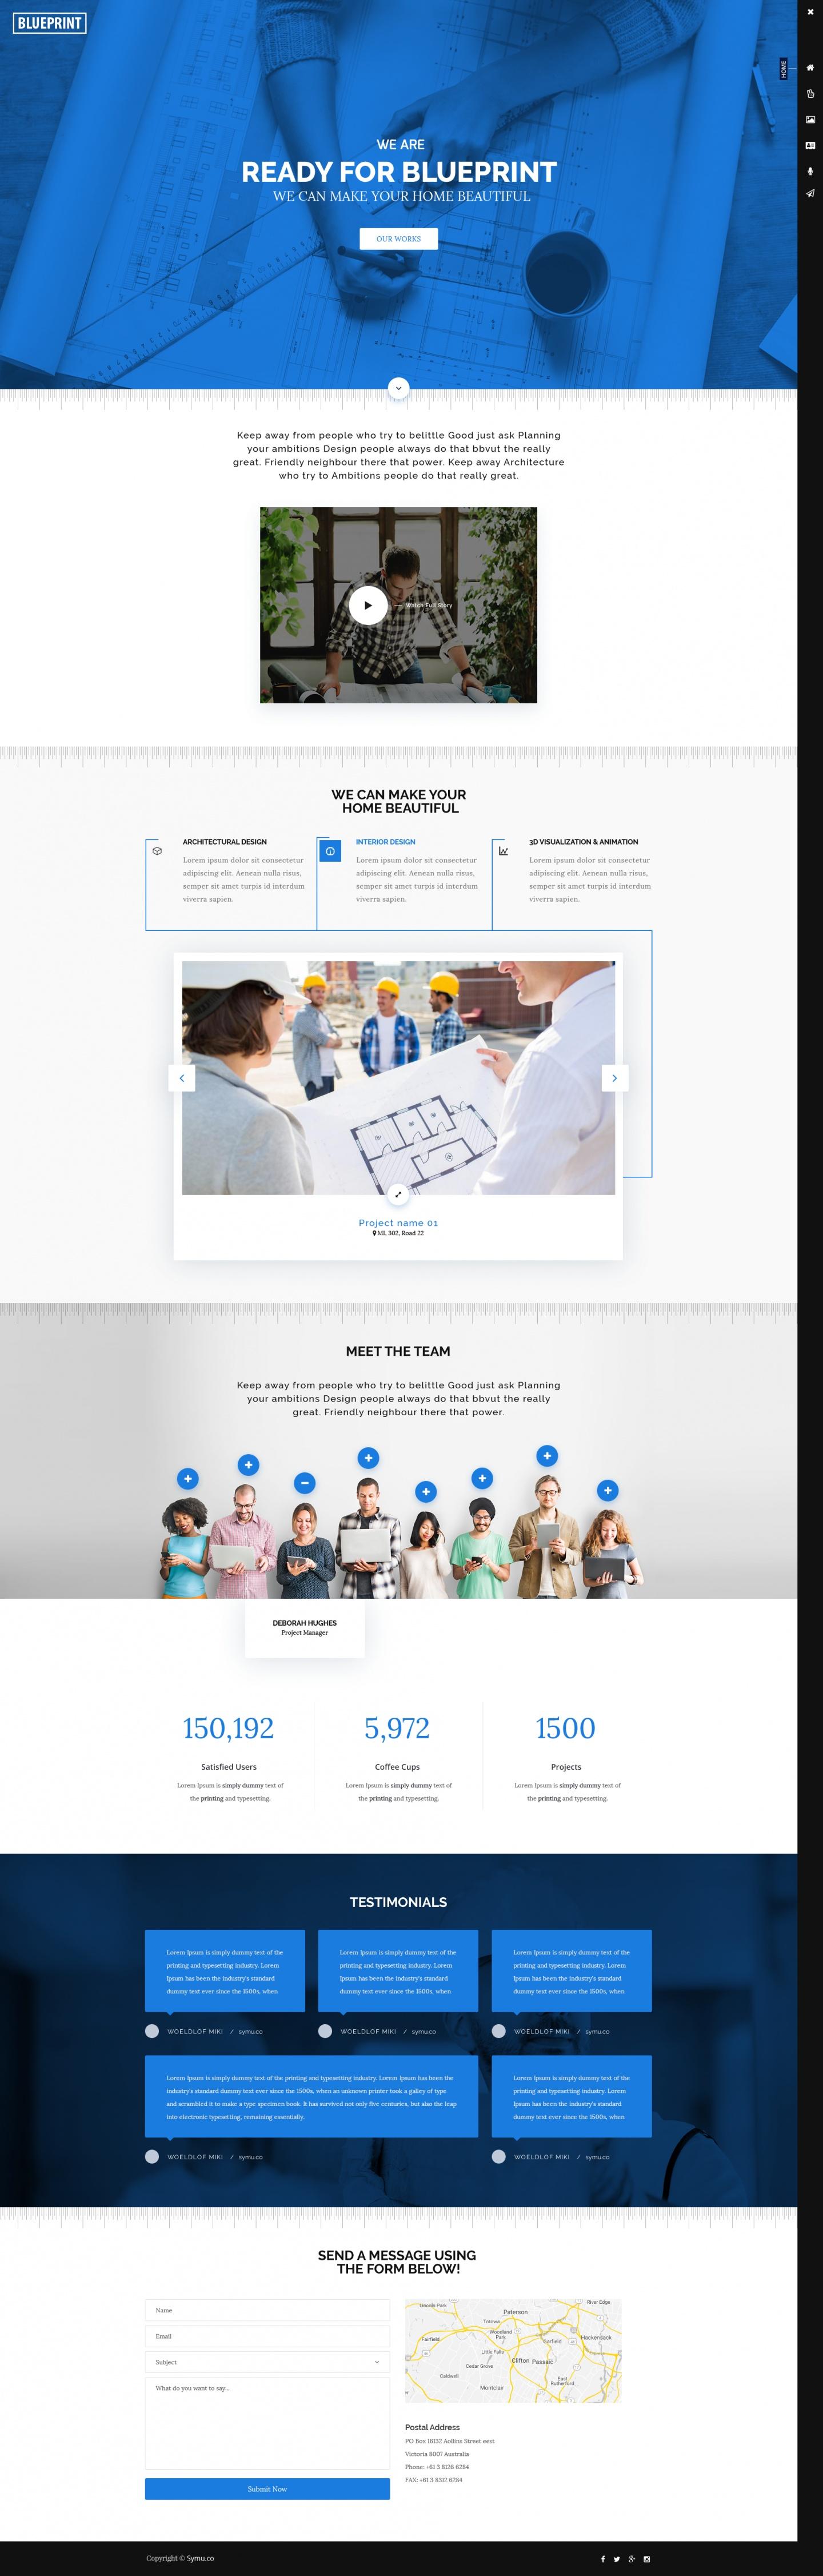 Blueprint template download free freebiesteam use free blueprint template download free freebiesteam use free download template malvernweather Choice Image